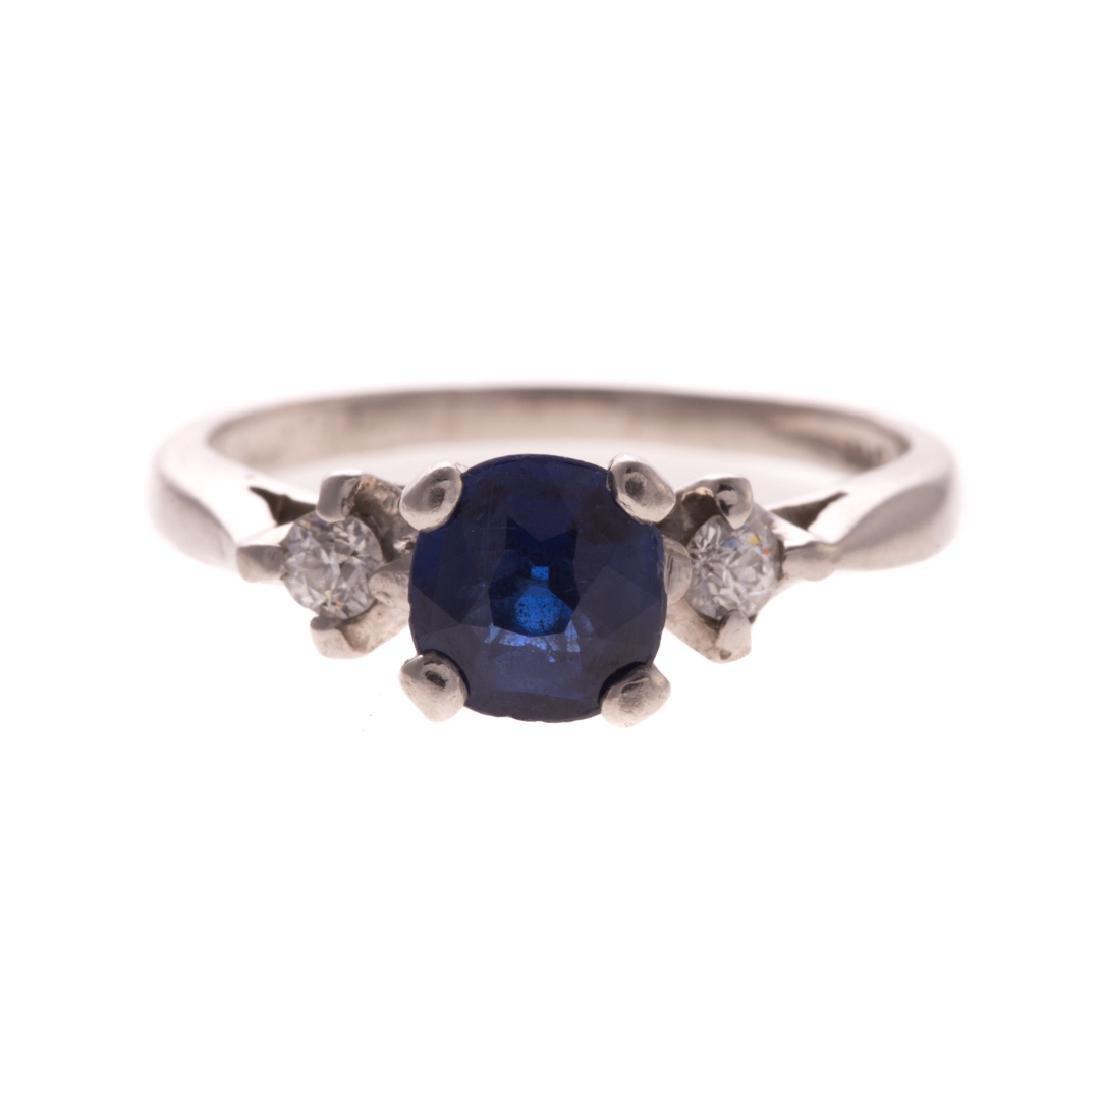 A Lady's Platinum Sapphire and Diamond Ring